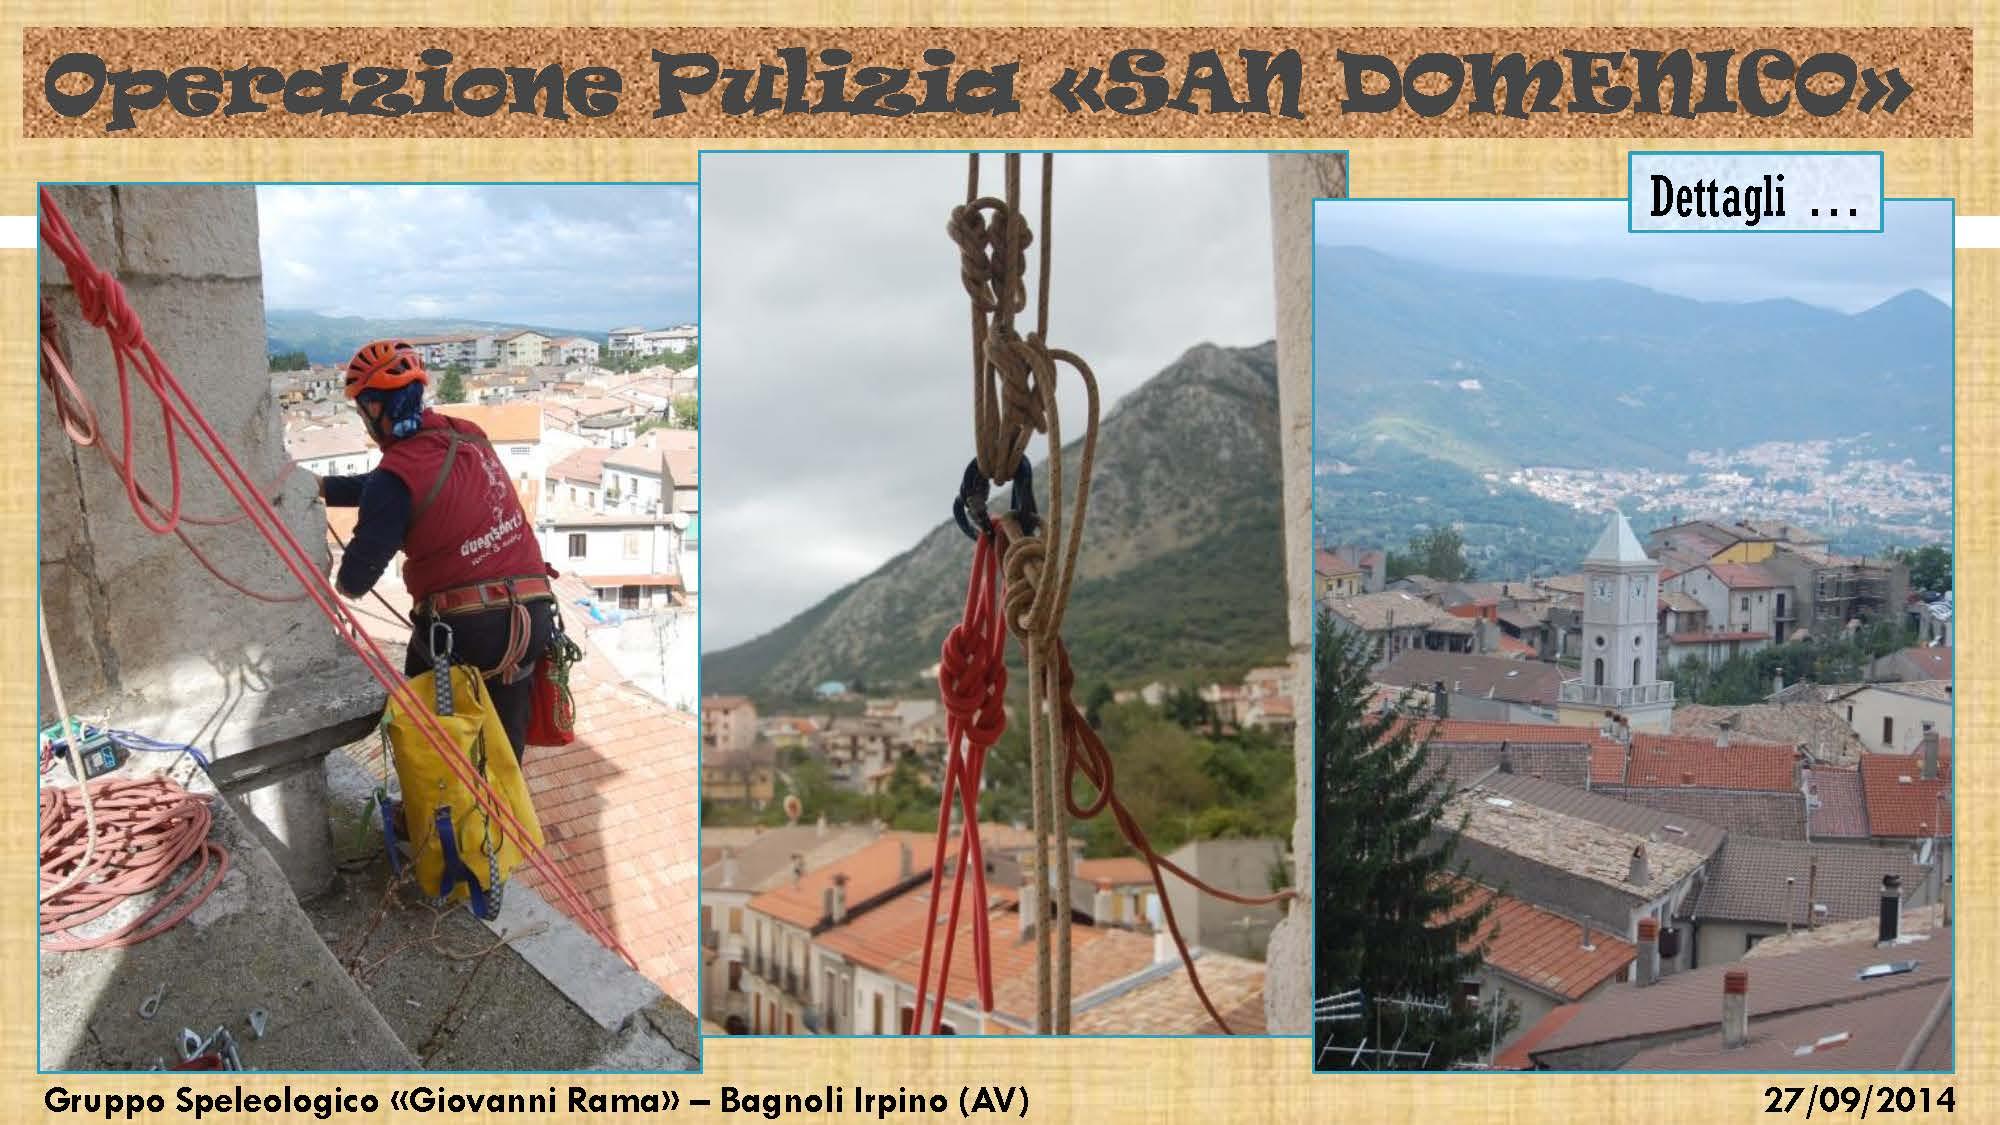 Bagnoli-Pulizia-San-Domenico-2014_Pagina_27